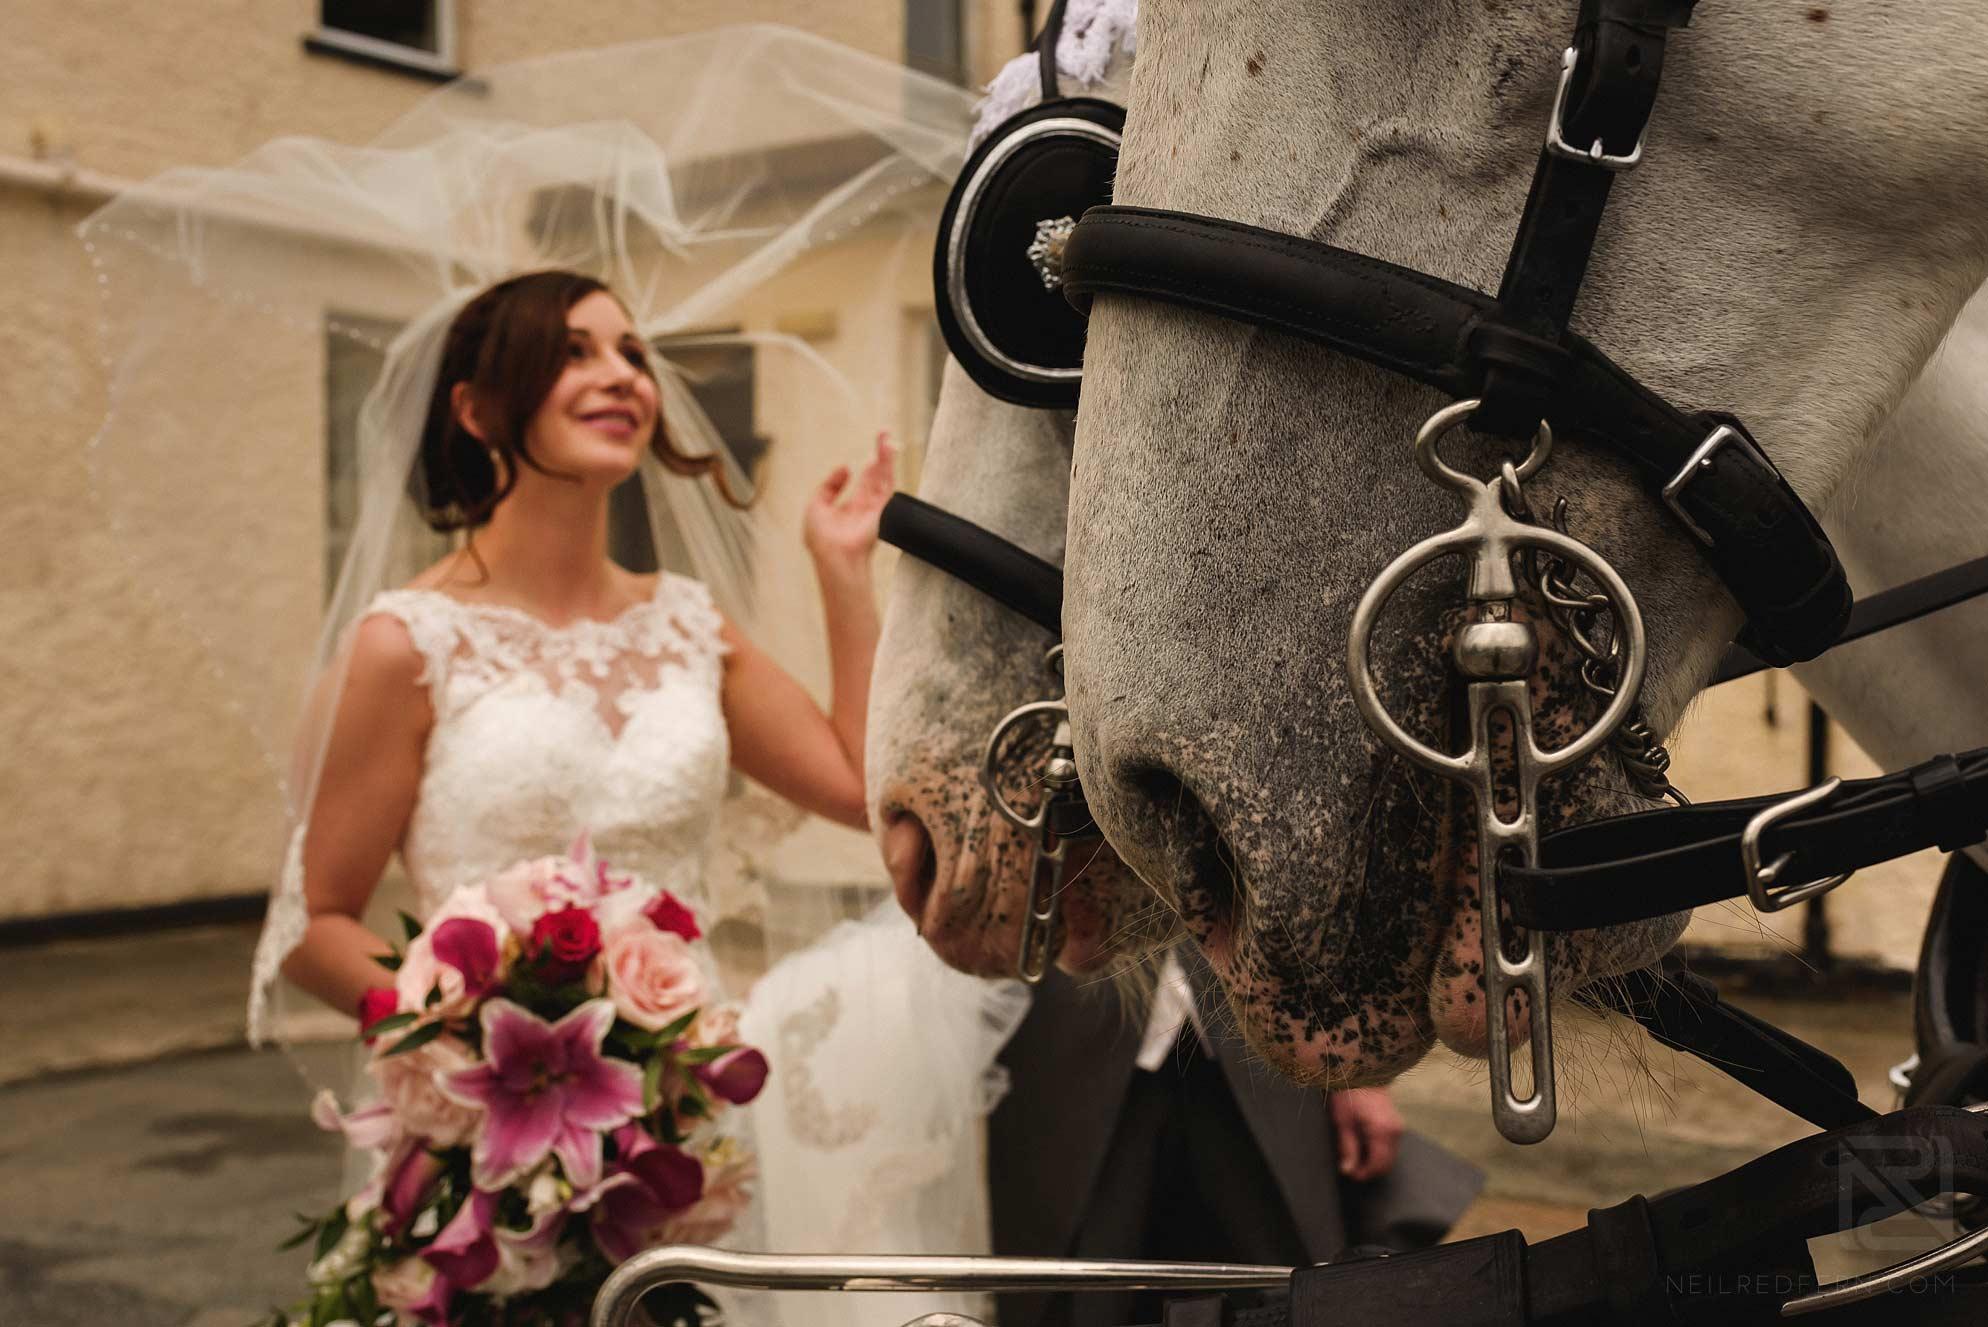 Metropole-Hotel-Llandrindod-Wells-wedding-13